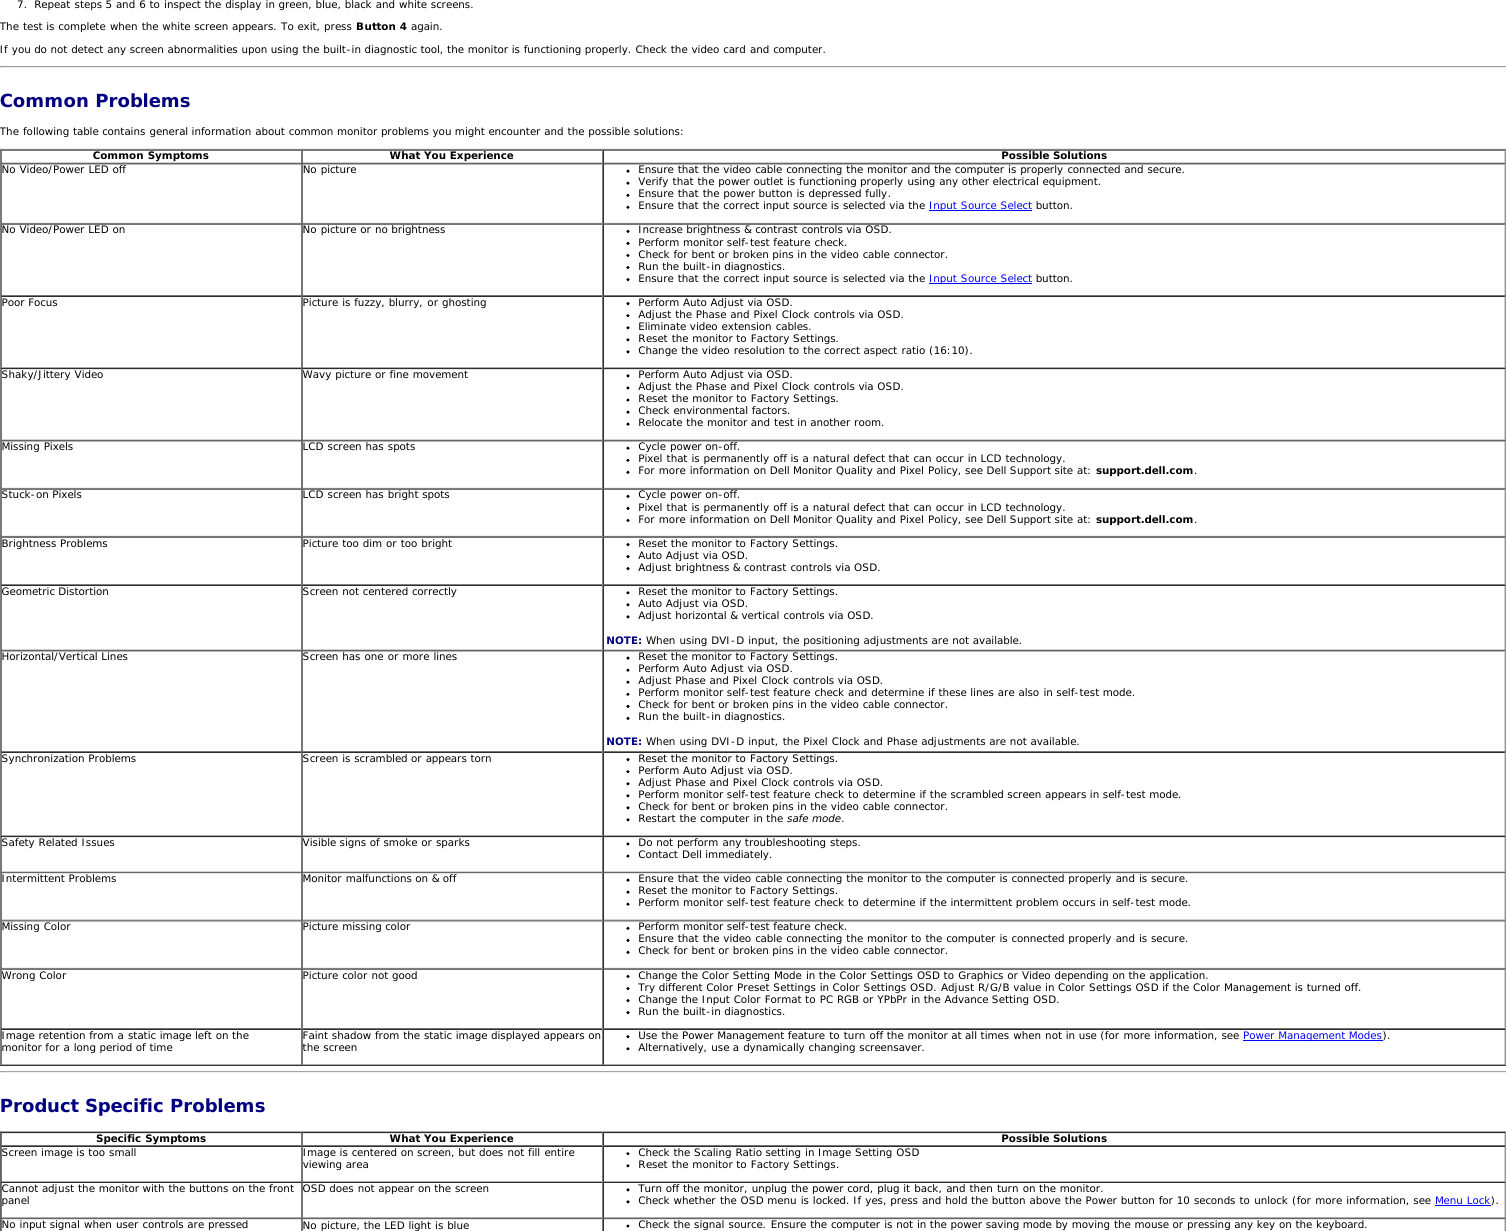 Dell u2412m Monitor User's Guide User Manual En us